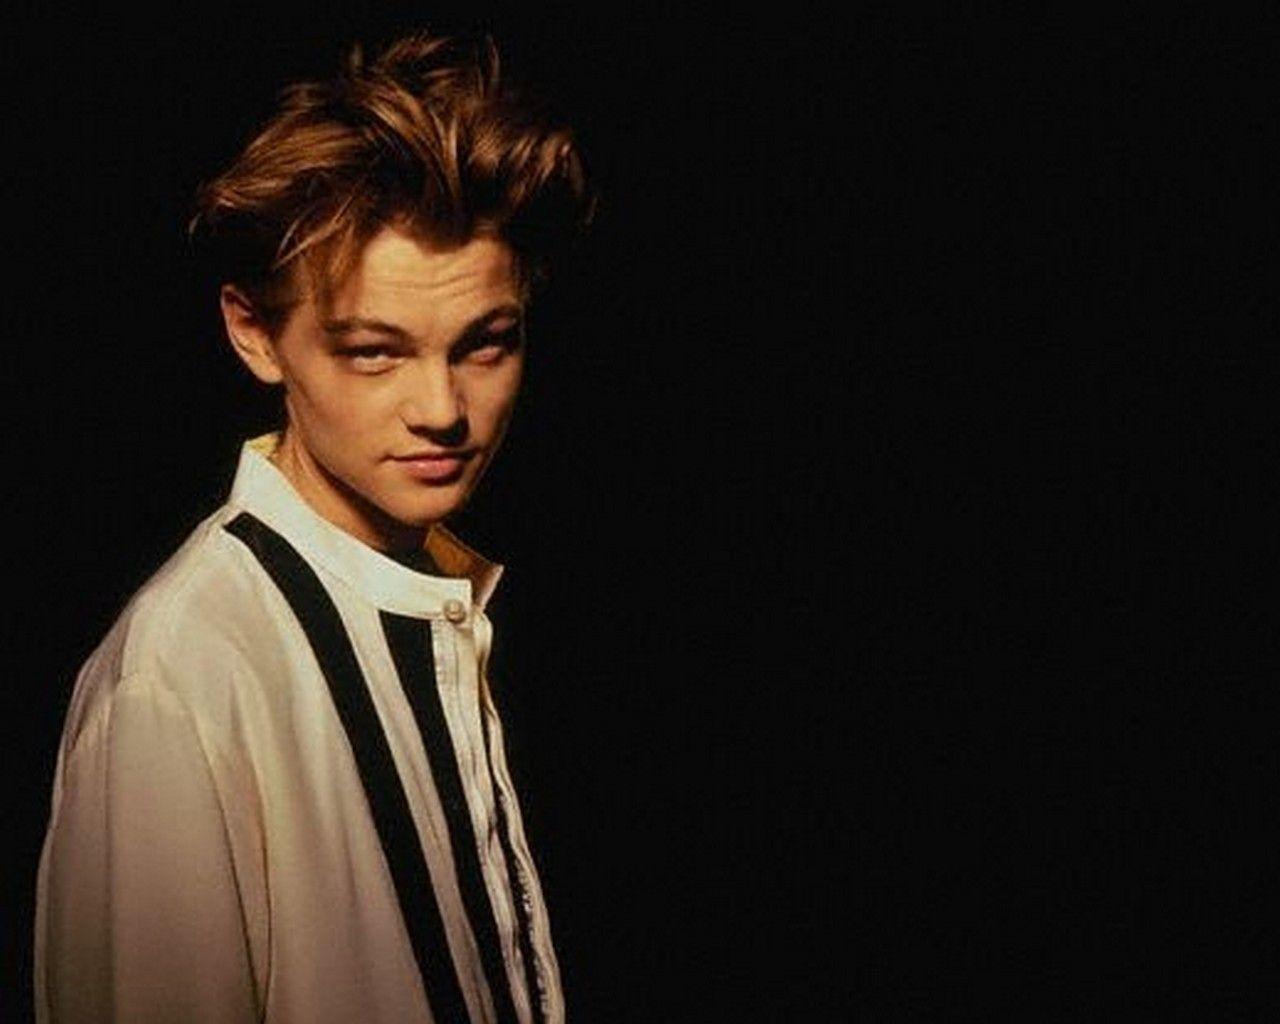 Titanic Leonardo DiCaprio Wallpapers - Wallpaper Cave